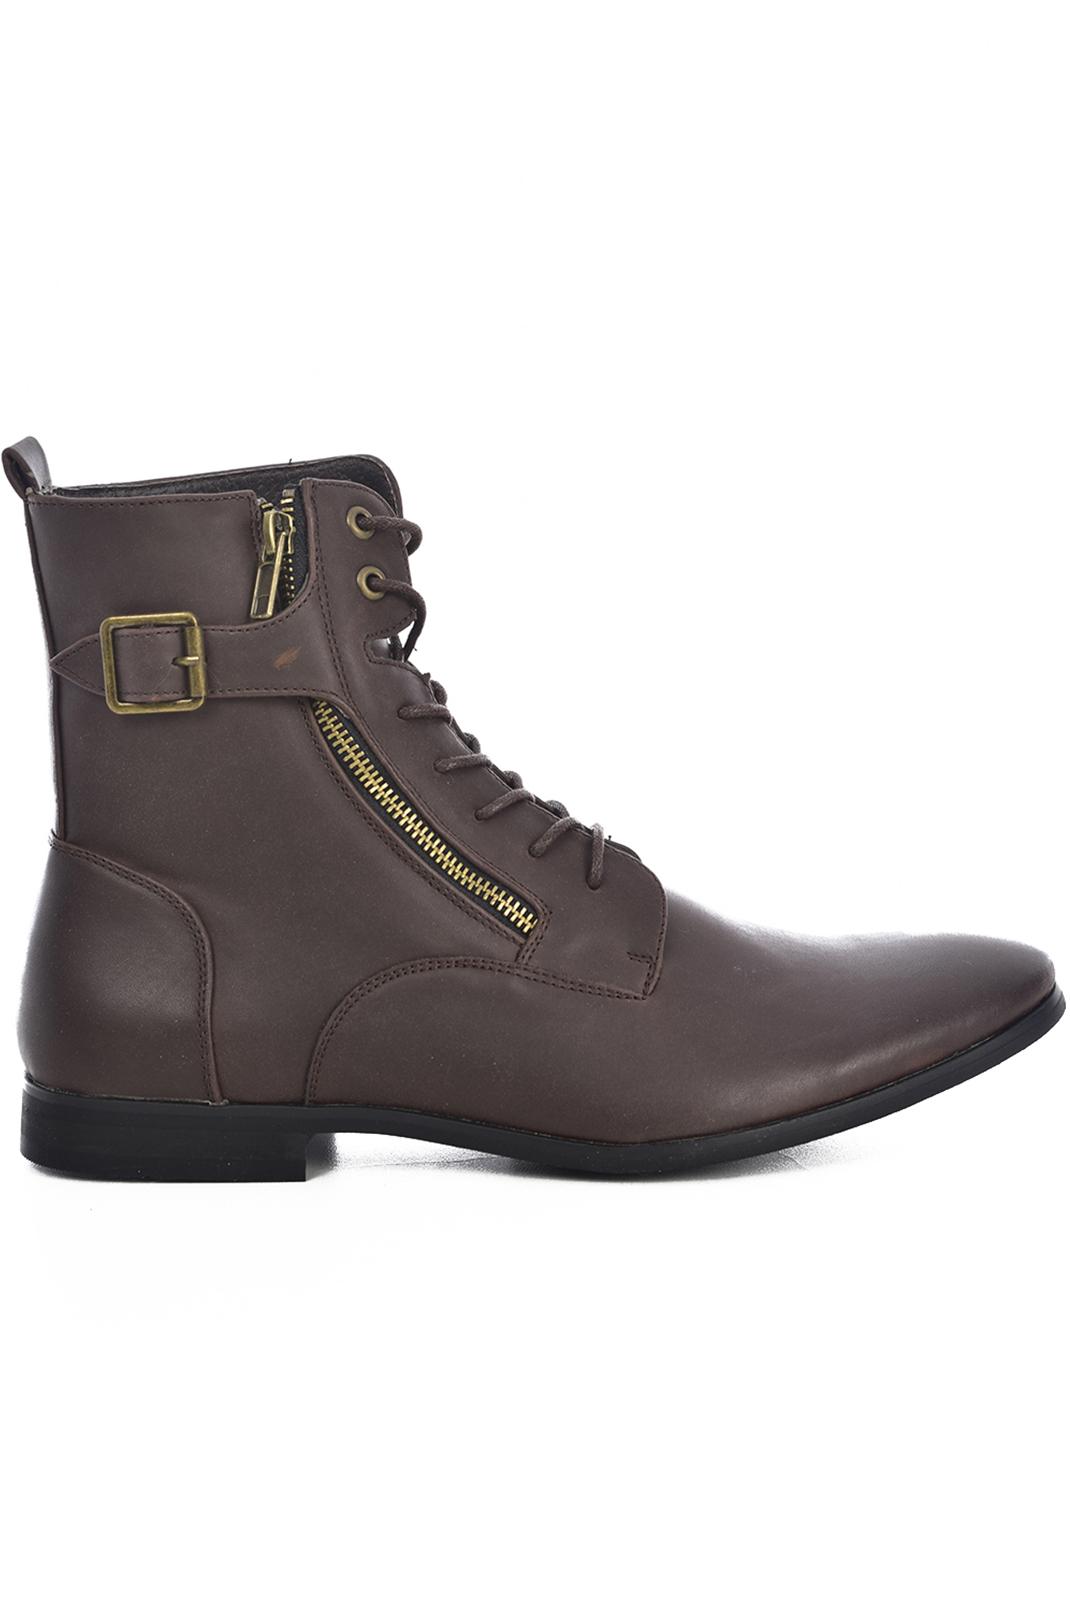 Chaussures de ville  Galax GLX3520 MARRON